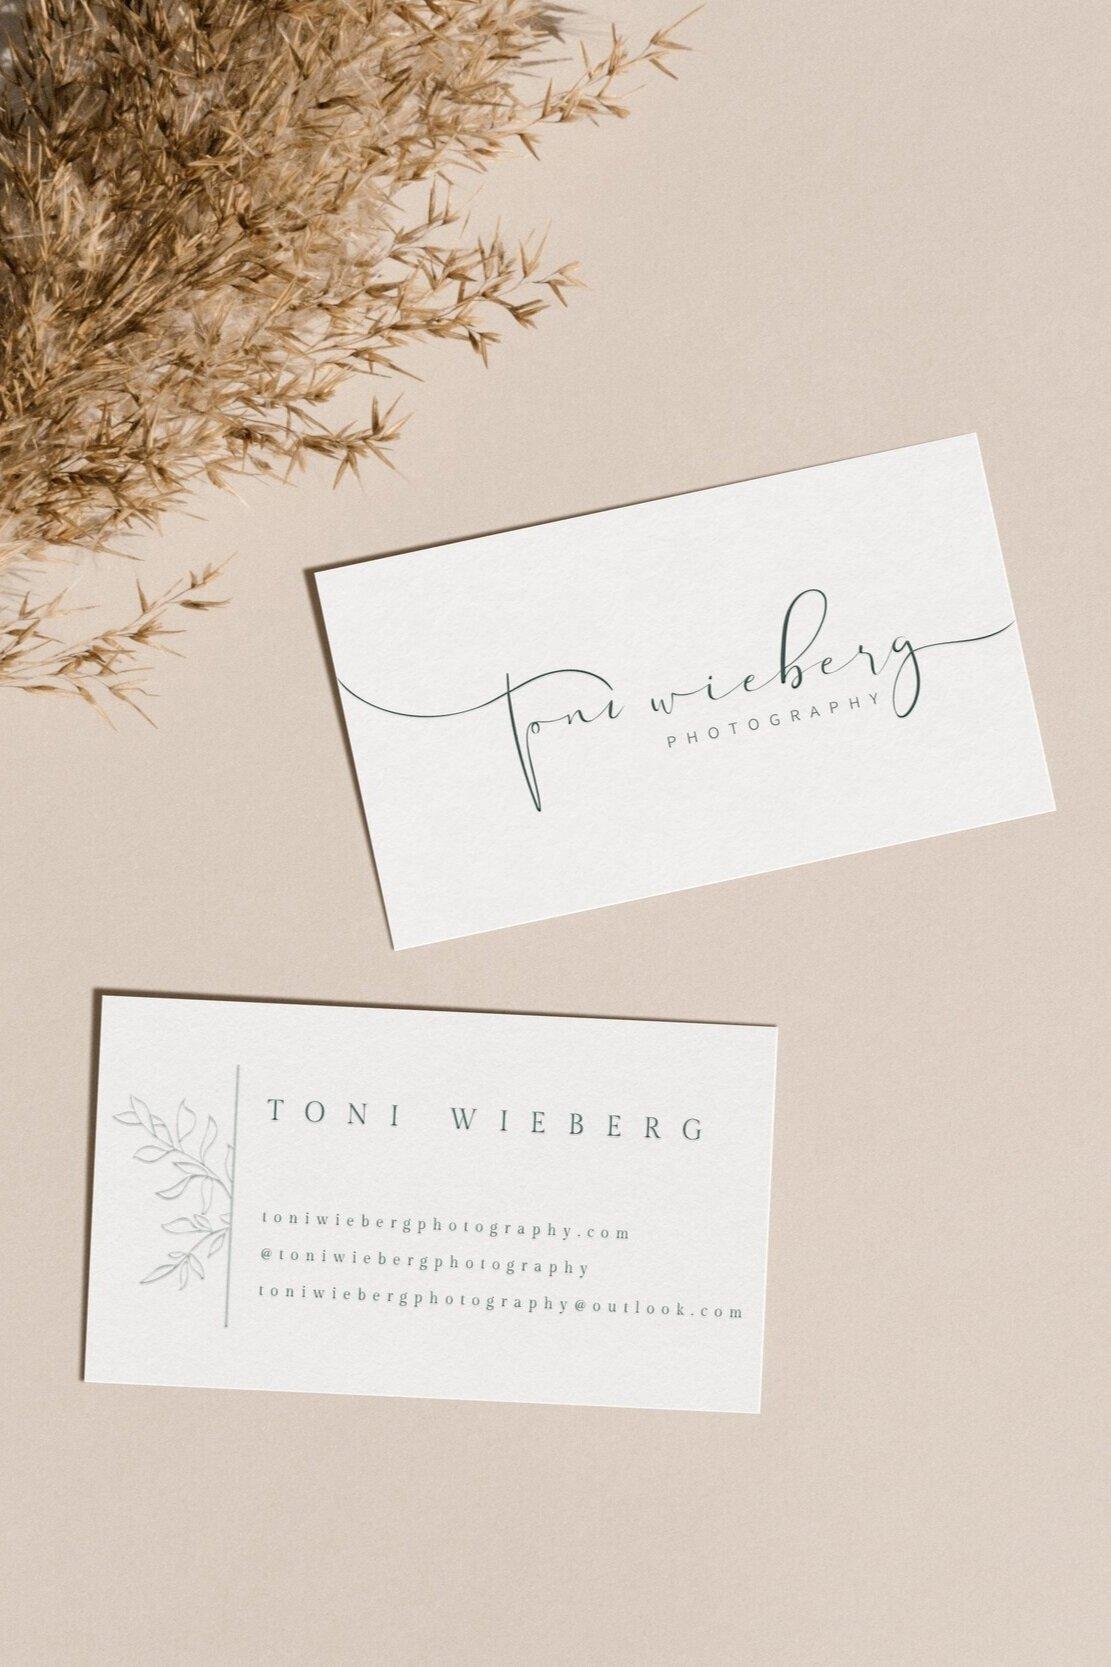 Toni-Wieberg-Biz-Card-Mockup-2-min.jpg